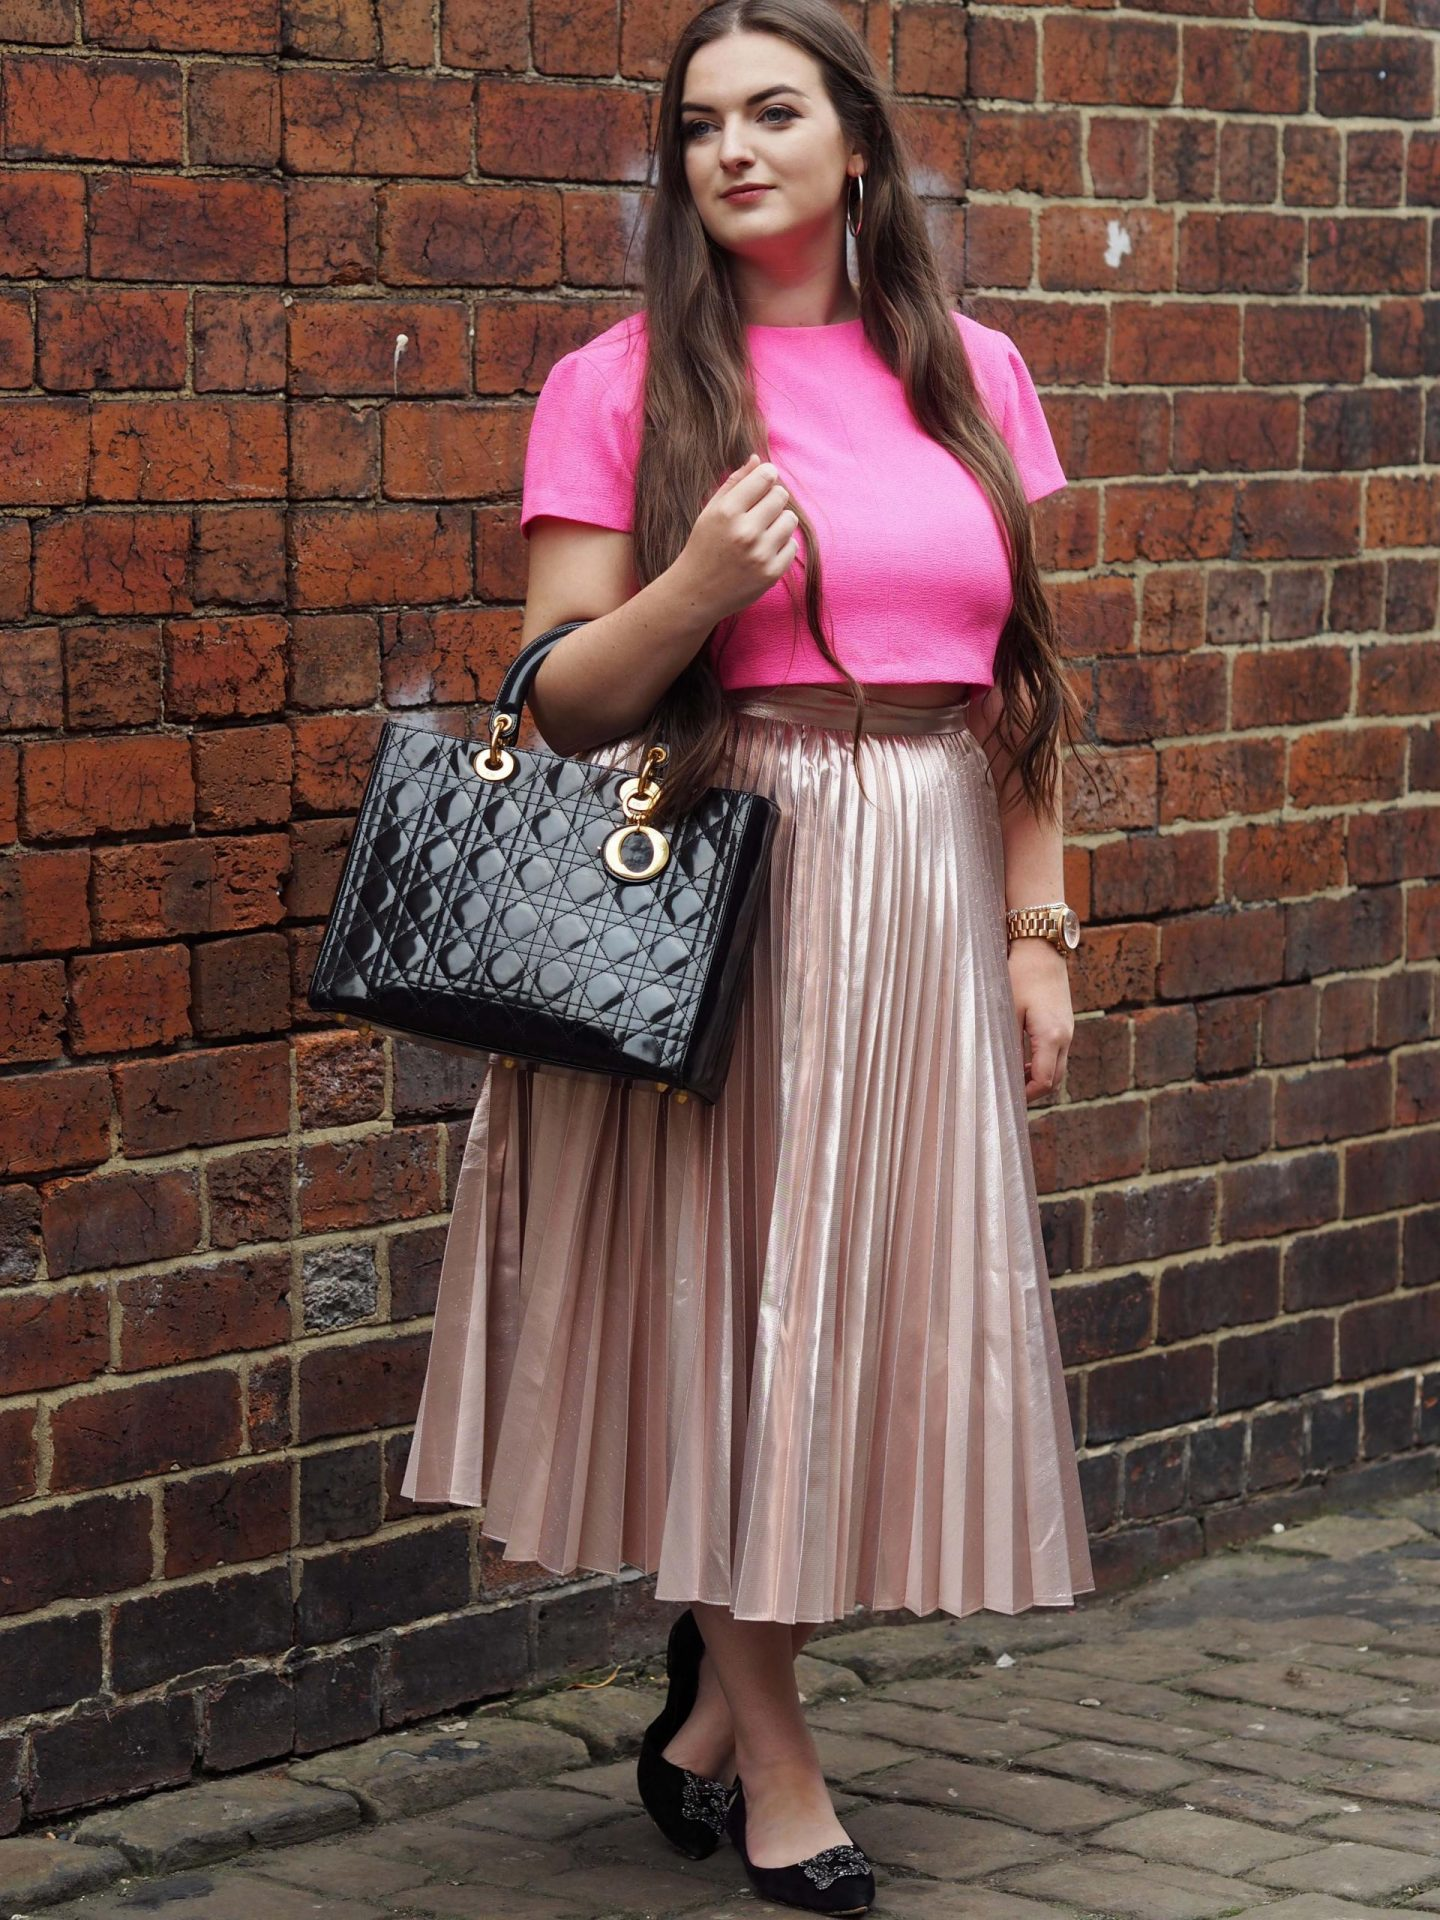 closet-london-pink-skirt-bloggers-blog-awards-2016-rachel-nicole-uk-blogger-1